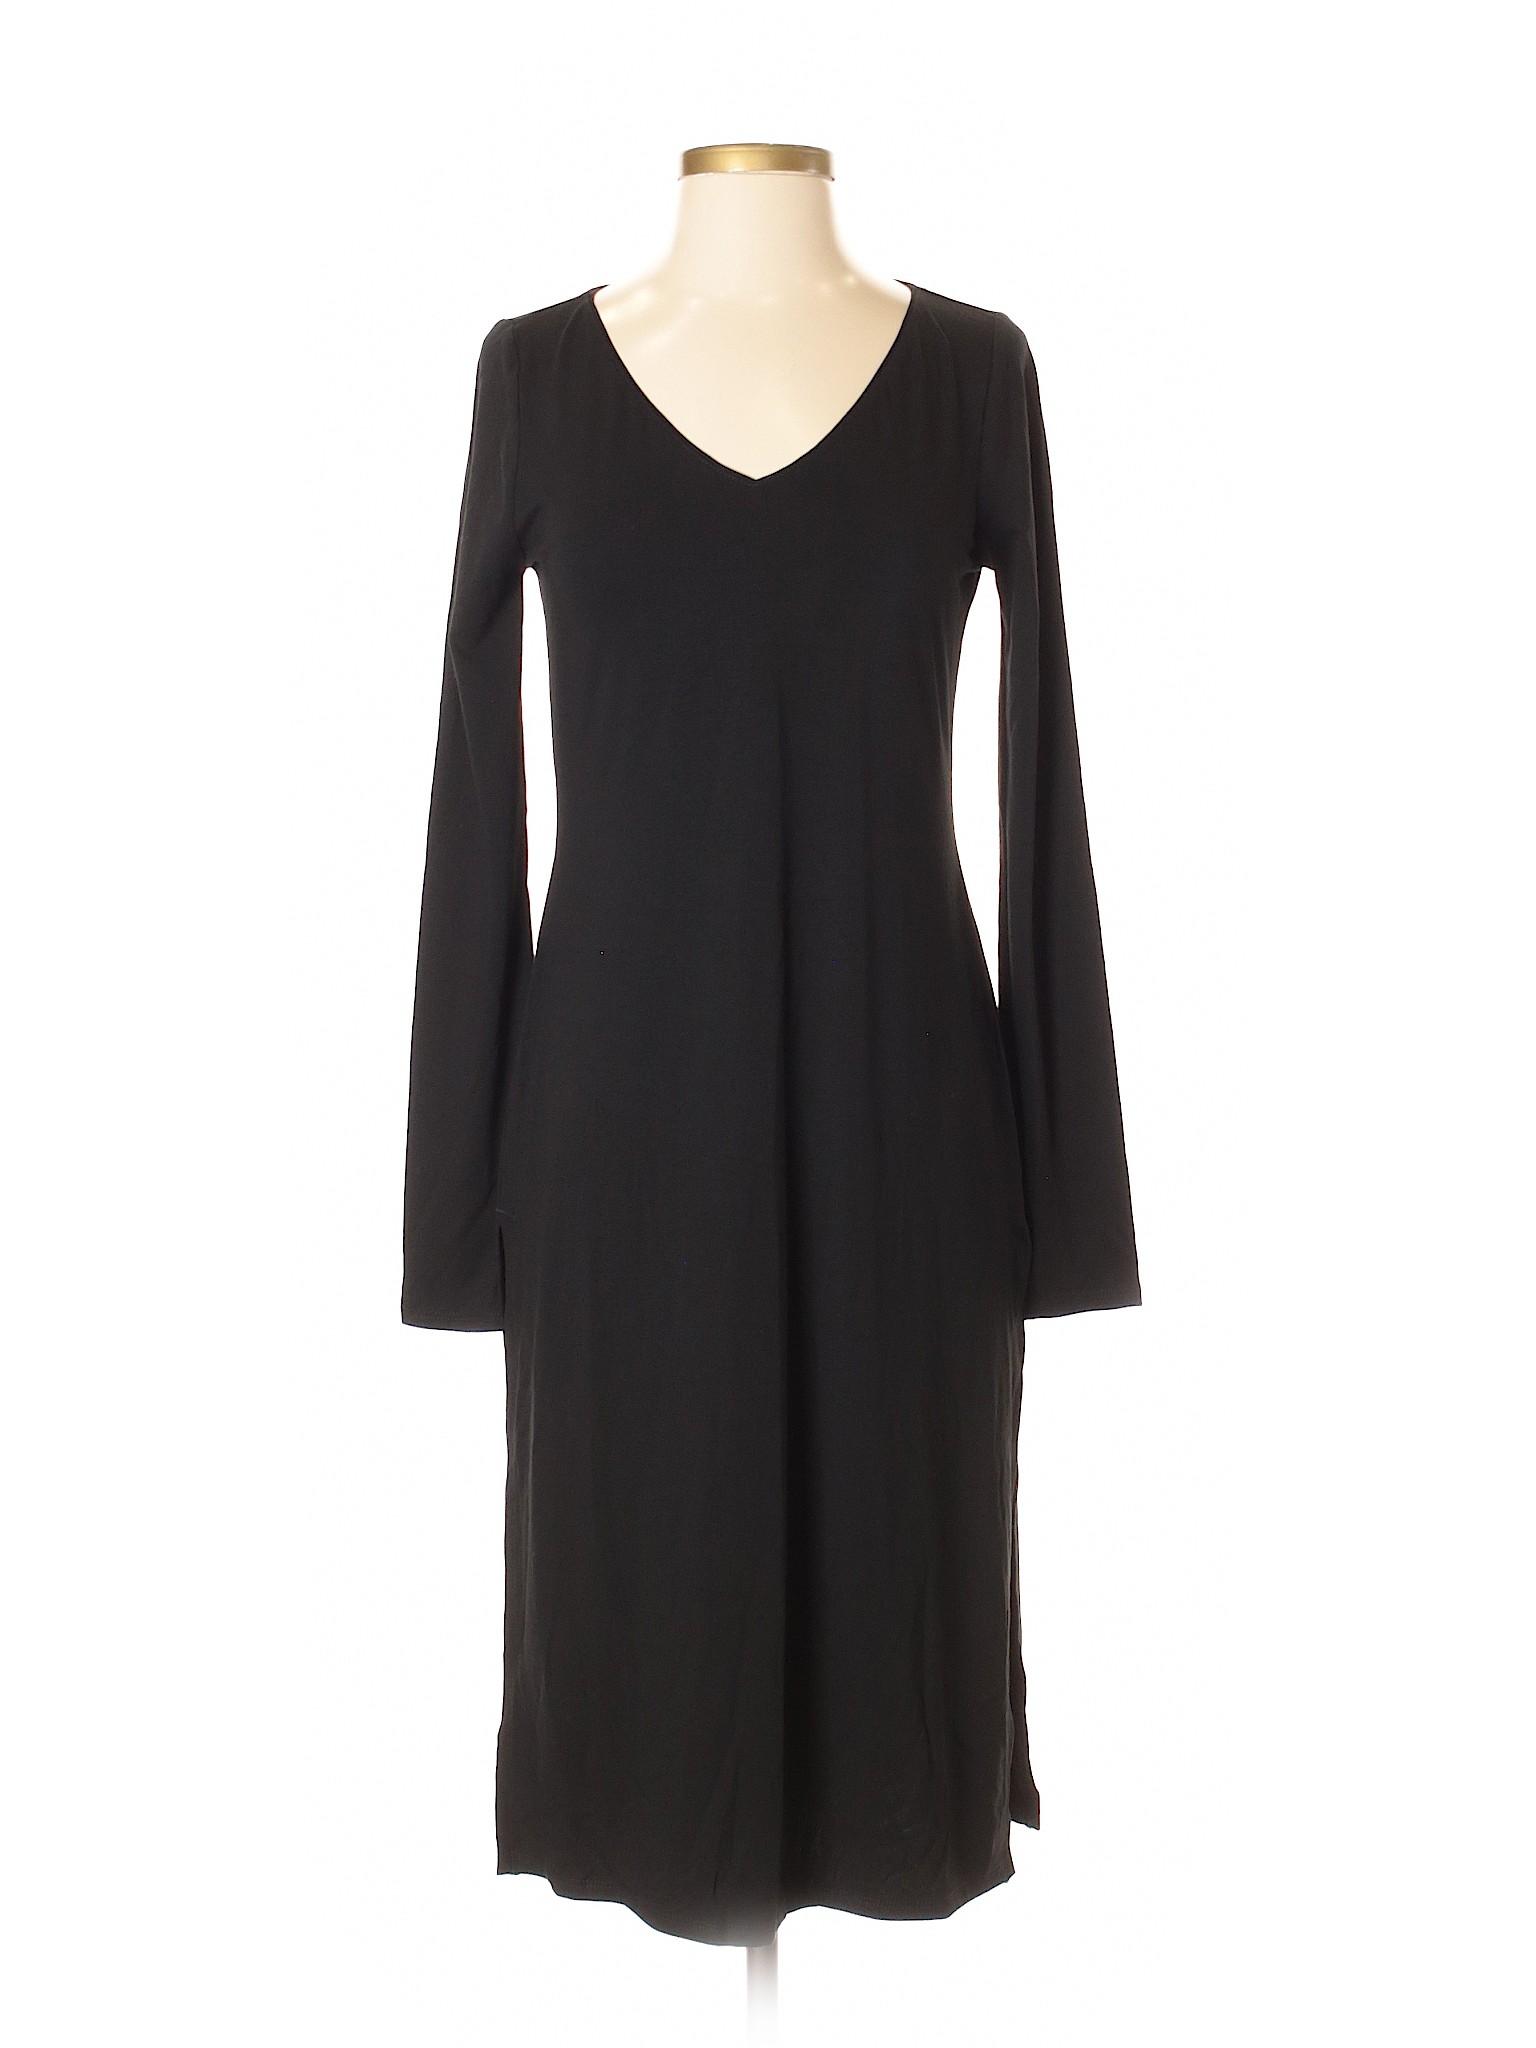 Market Boutique White winter Casual Dress House Black 0W0qcA6